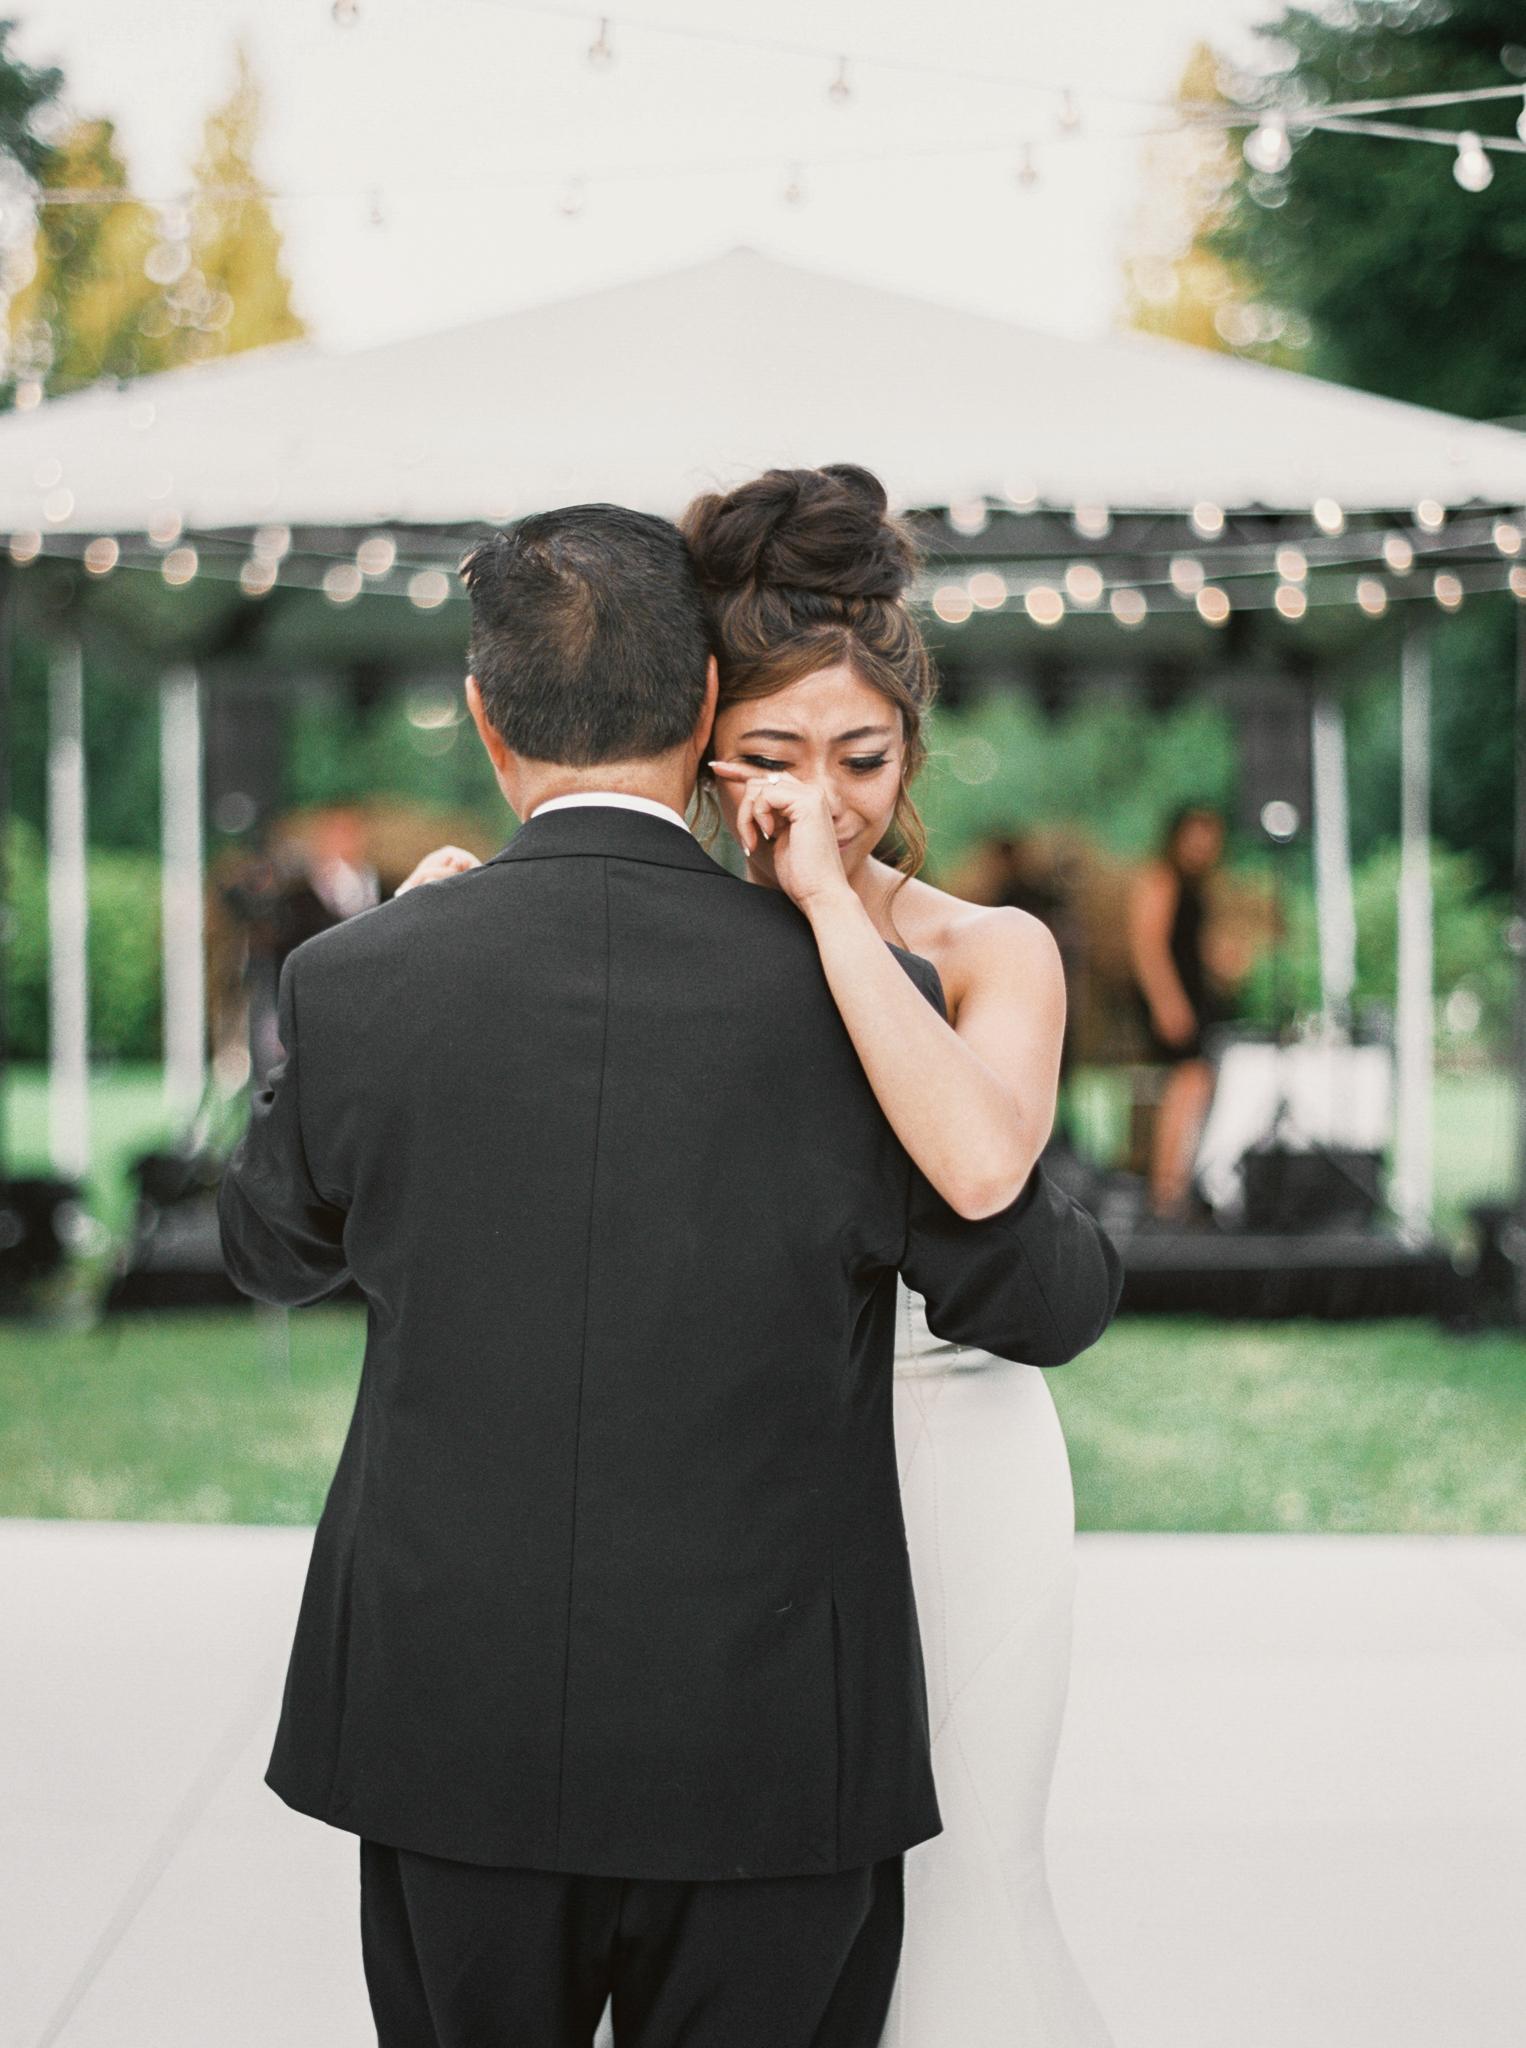 183OutliveCreative_Travel_Photographer_Videographer_Lewis&Clark_Oregon_Elegant_BlackTie_Destination_Wedding.jpg